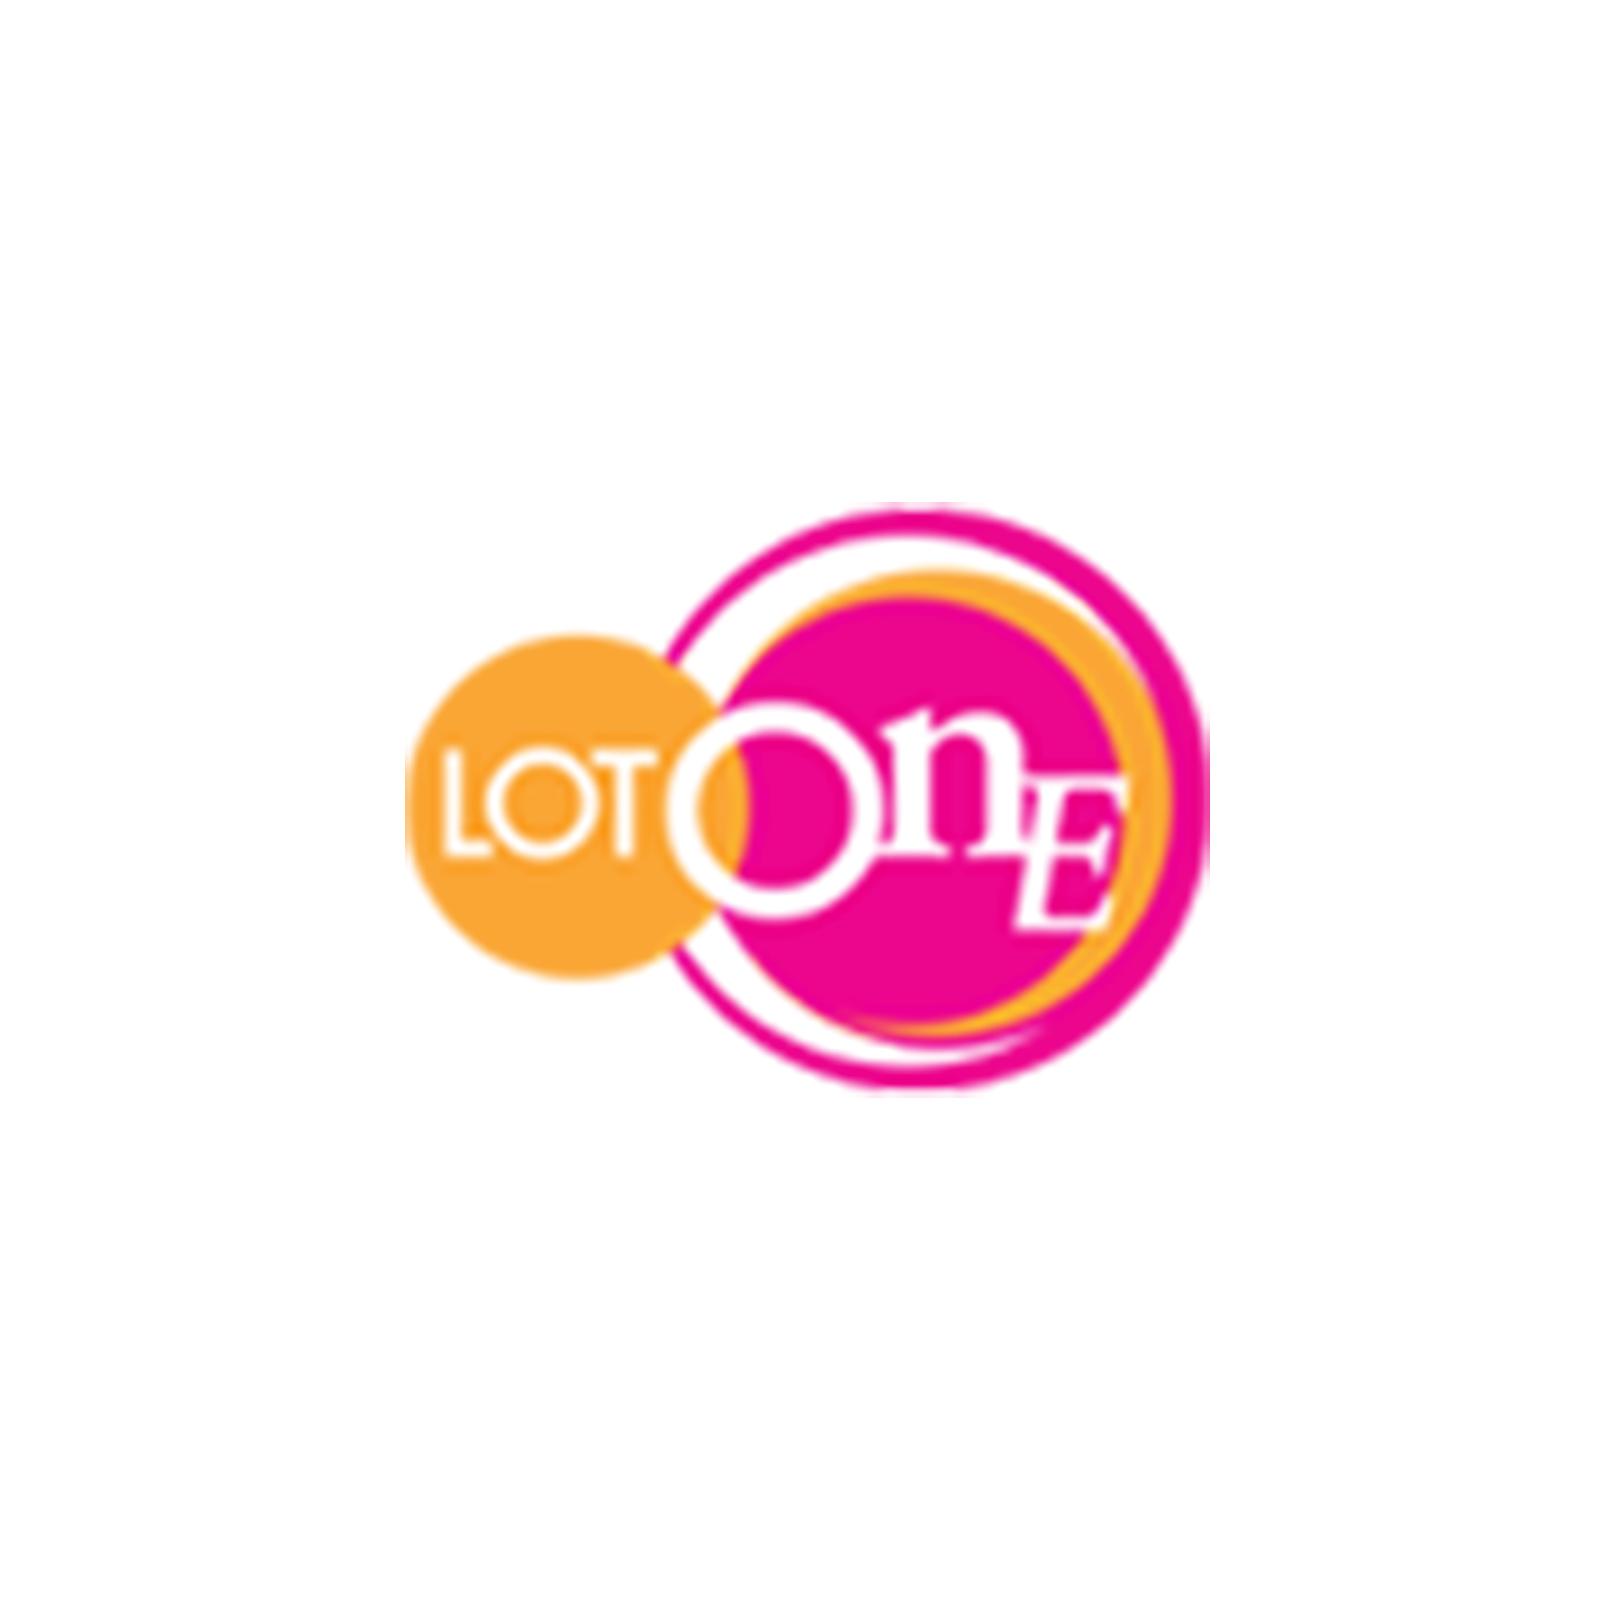 lotone.jpg